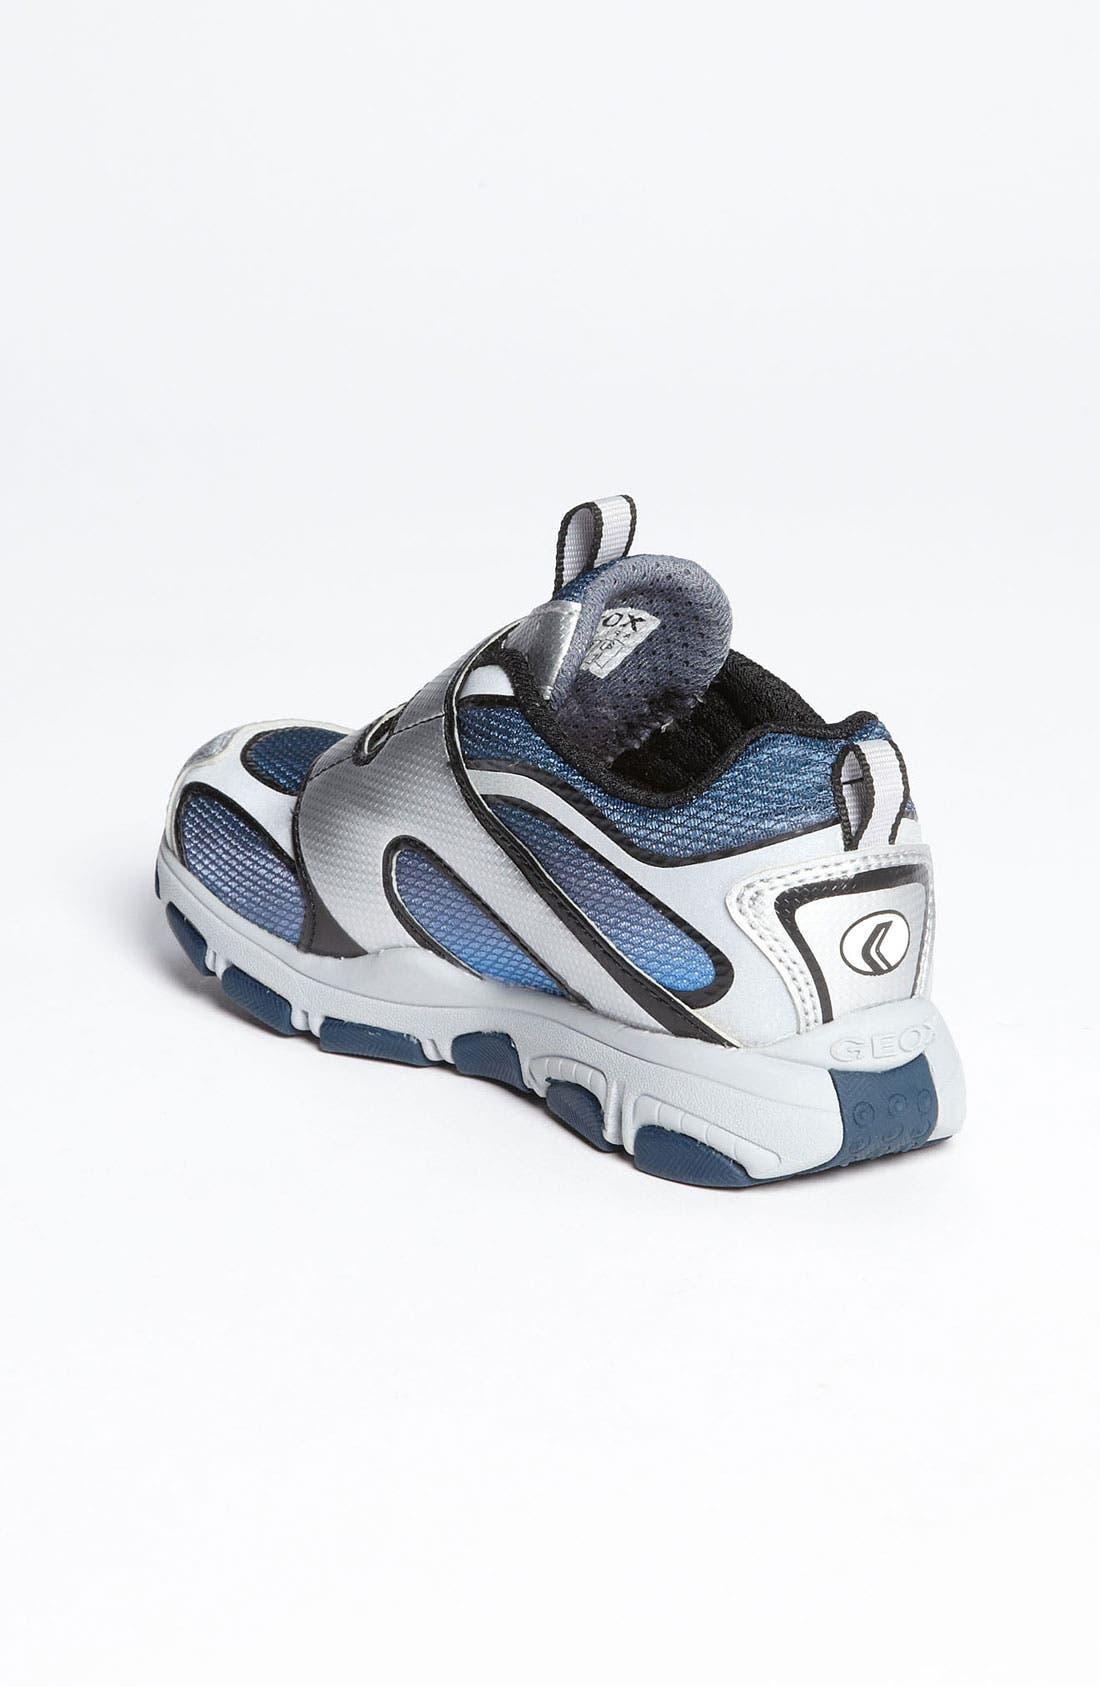 Alternate Image 2  - Geox 'J Torque' Sneaker (Toddler & Little Kid)